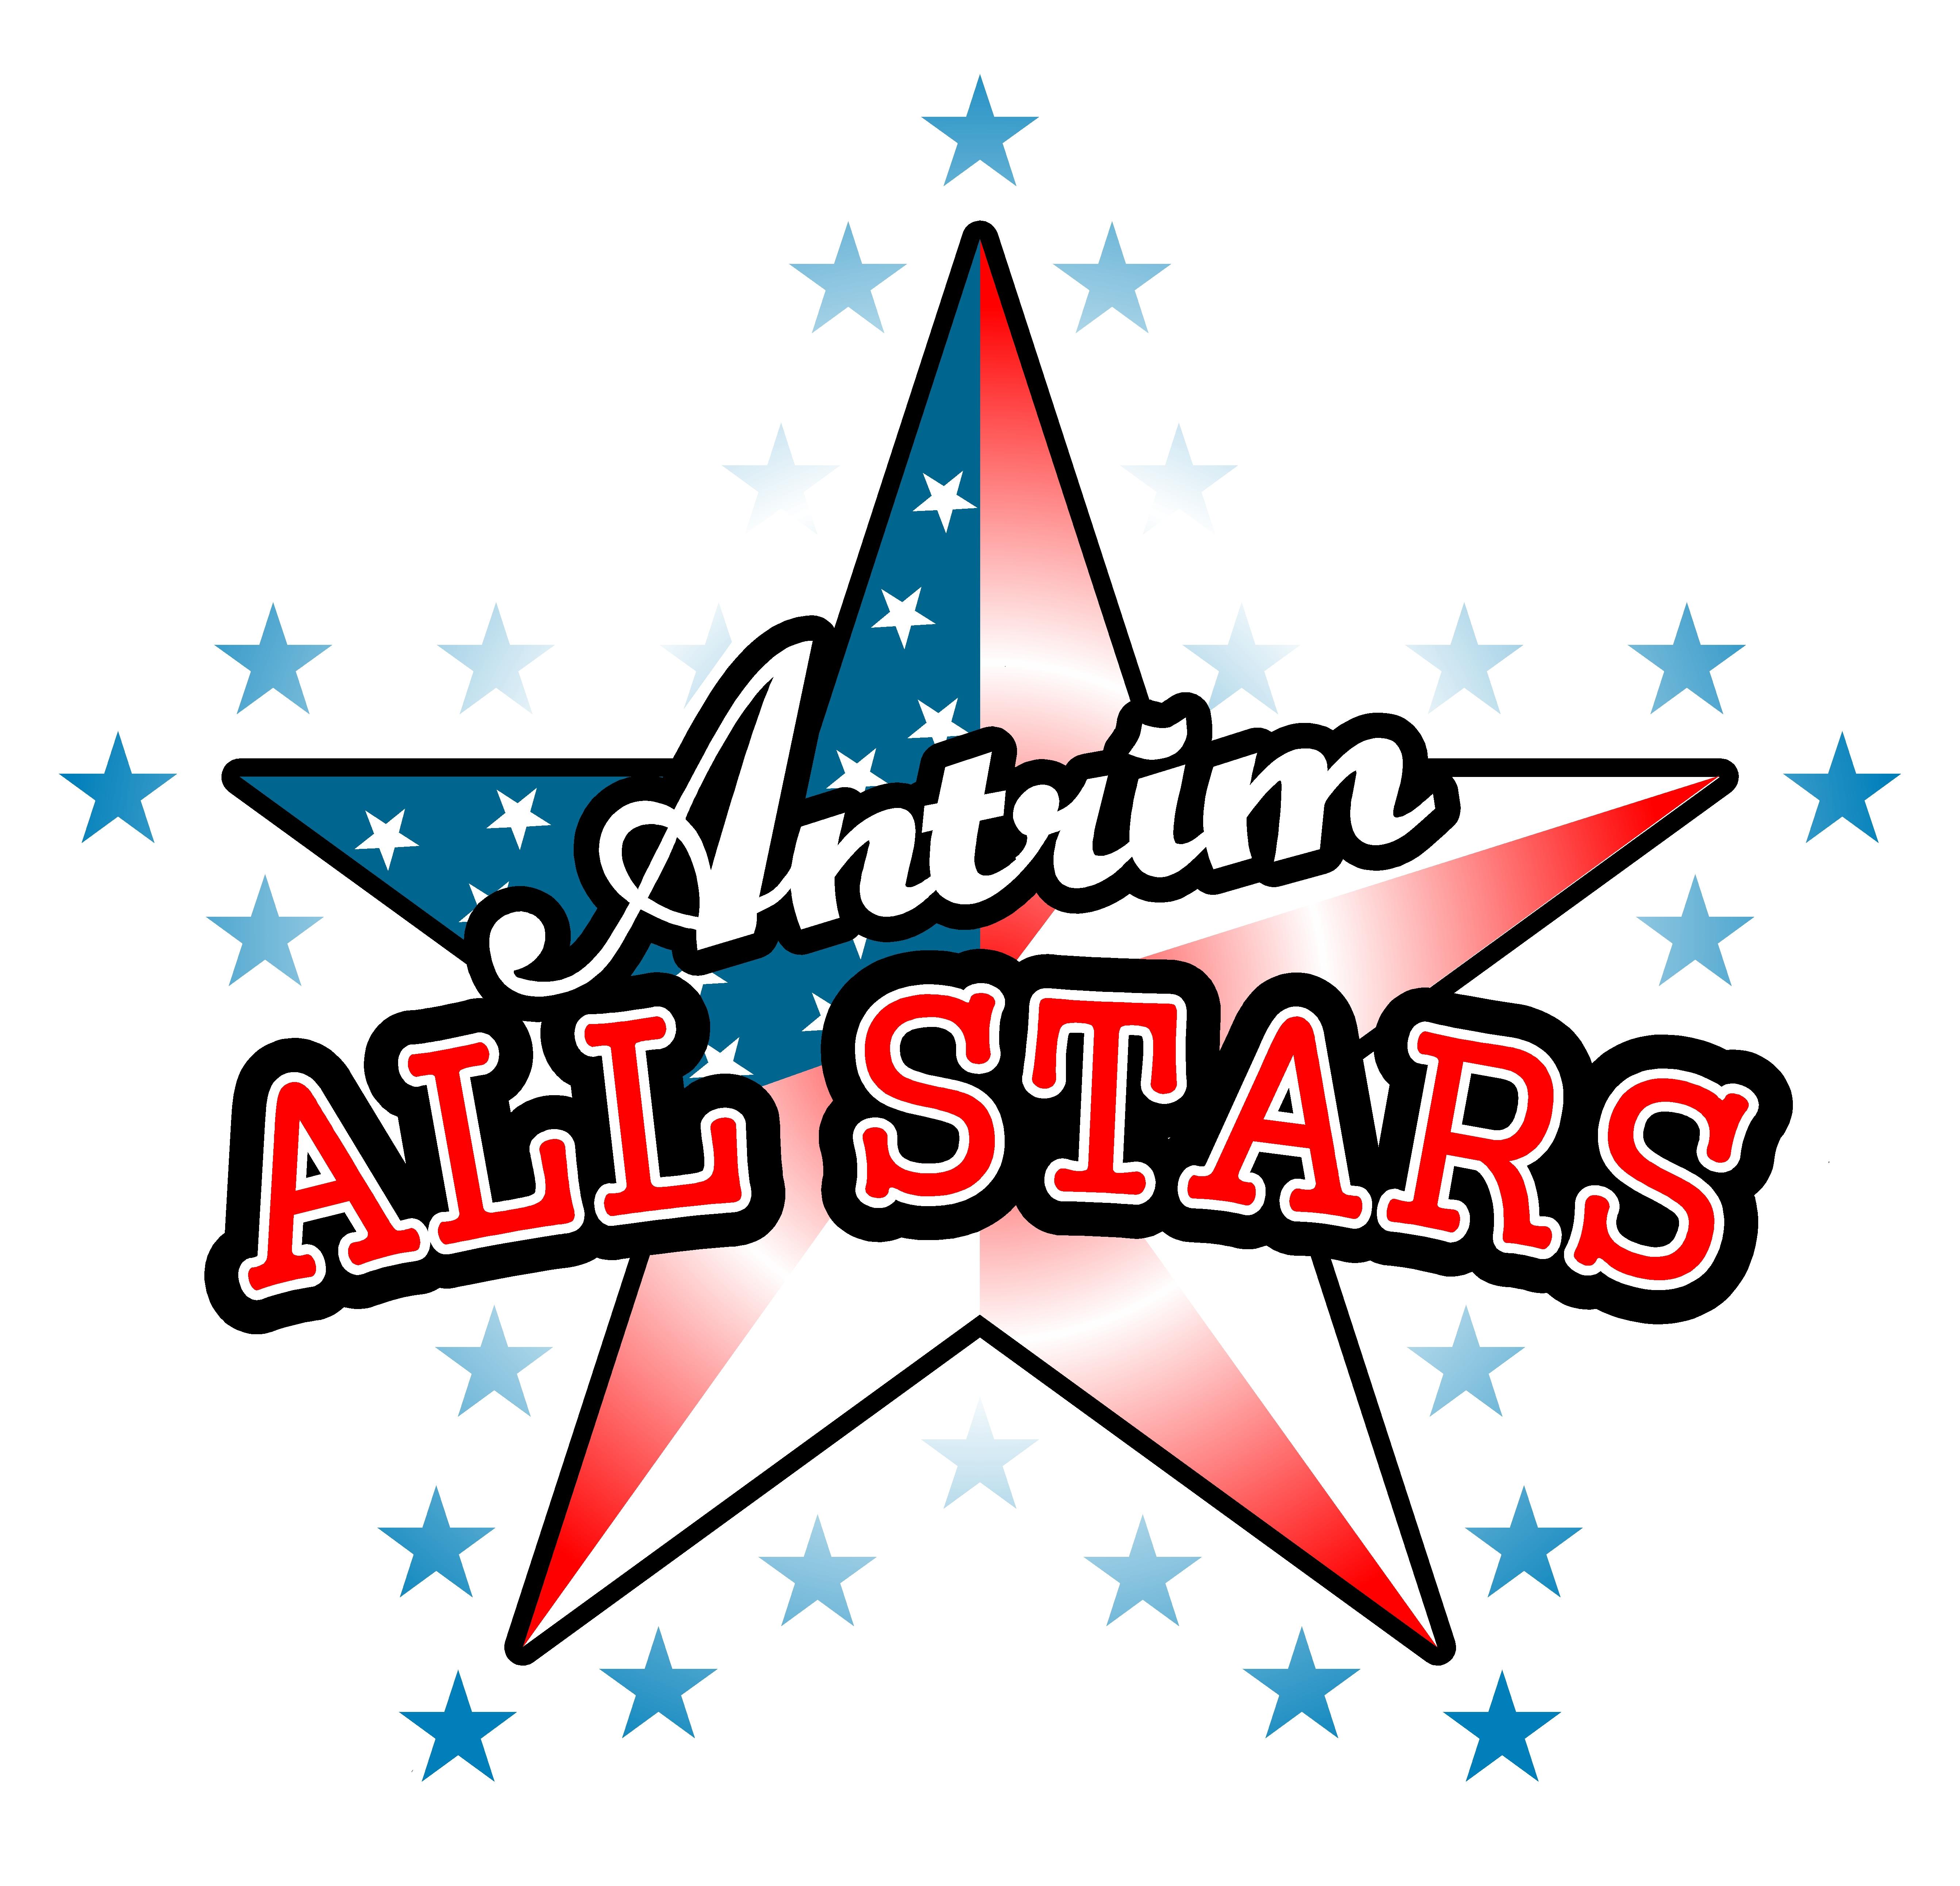 antrim all stars logo nistars